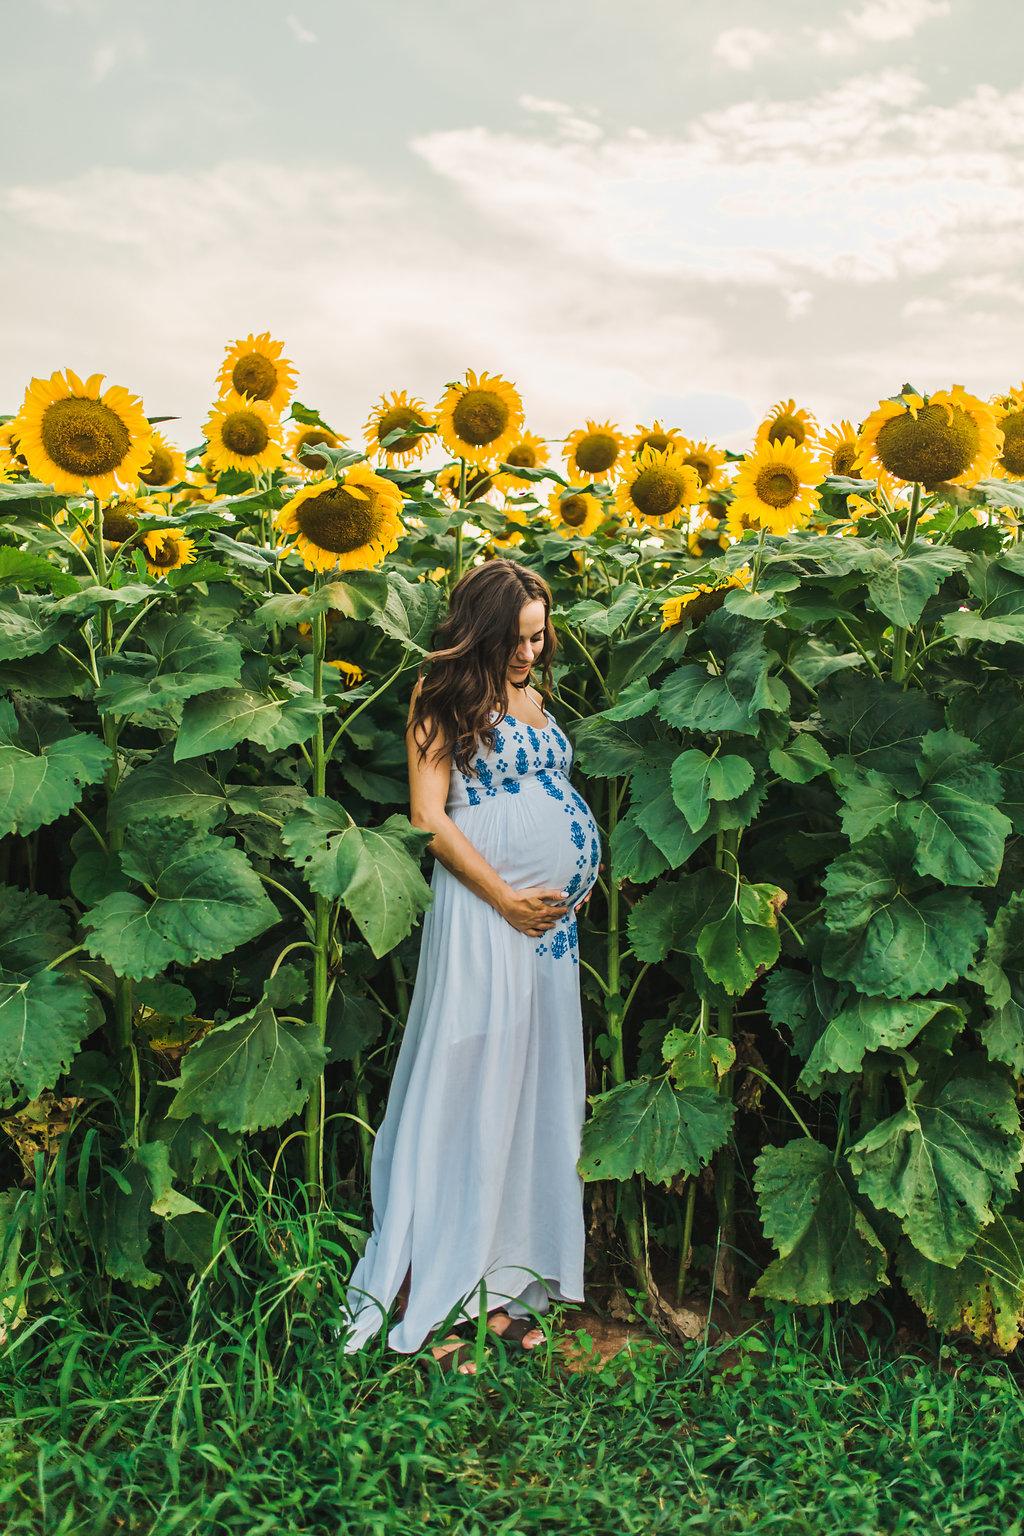 Sunflower-Maternity-Nashville-Tennessee-Field-Batey-Farms-1